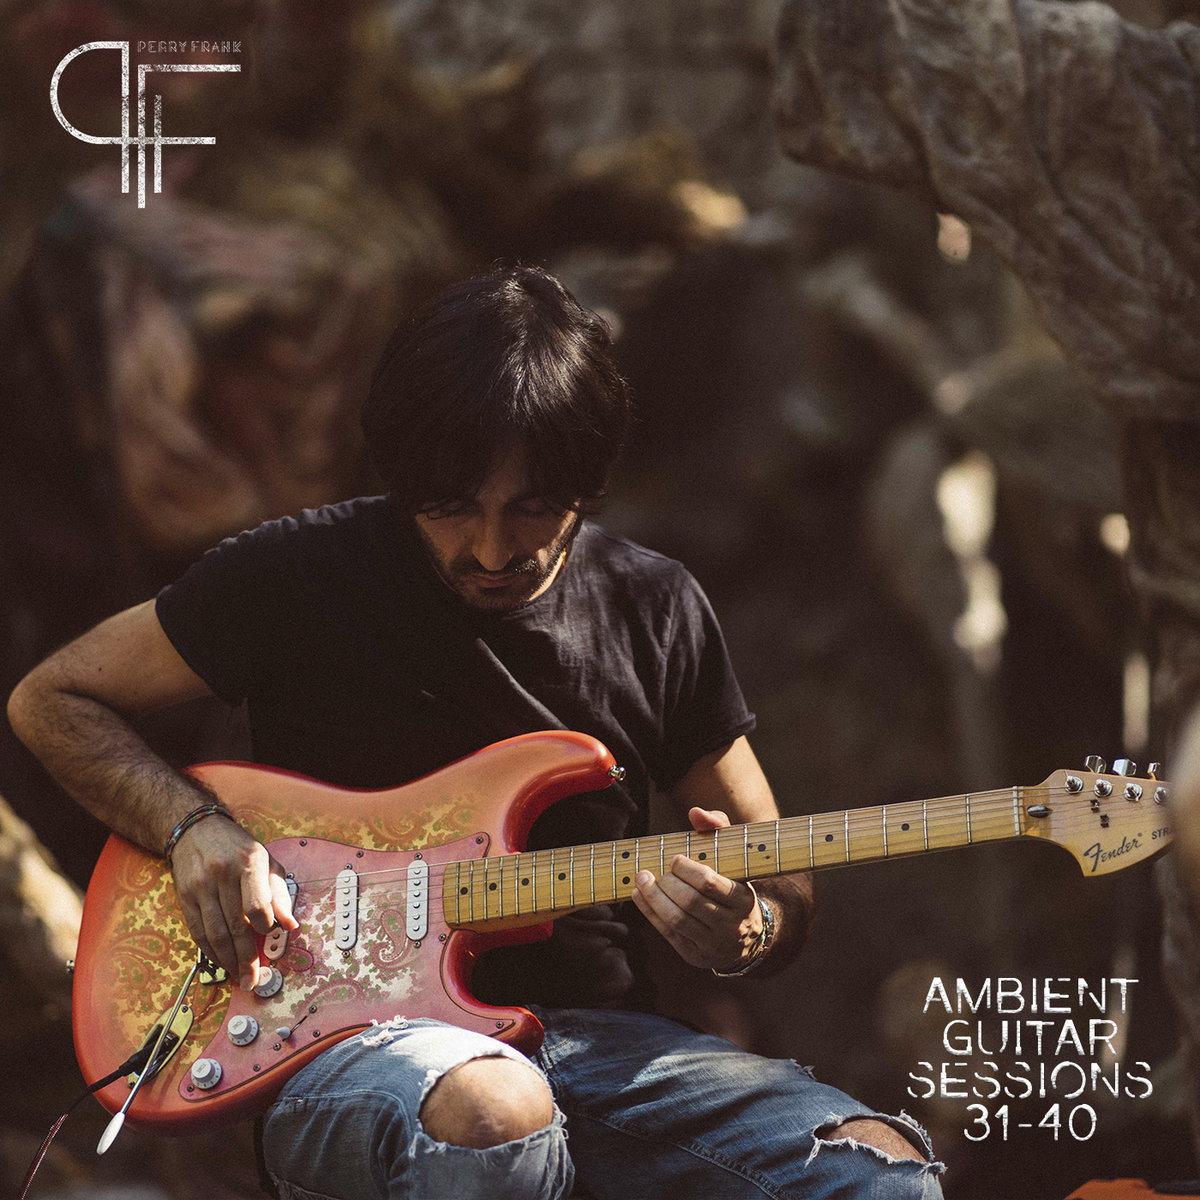 Perry Frank - Ambient Guitar Sessions - 31-40 - Francesco Perra - Bandcamp - player - 2020 - Sa Scena Sarda